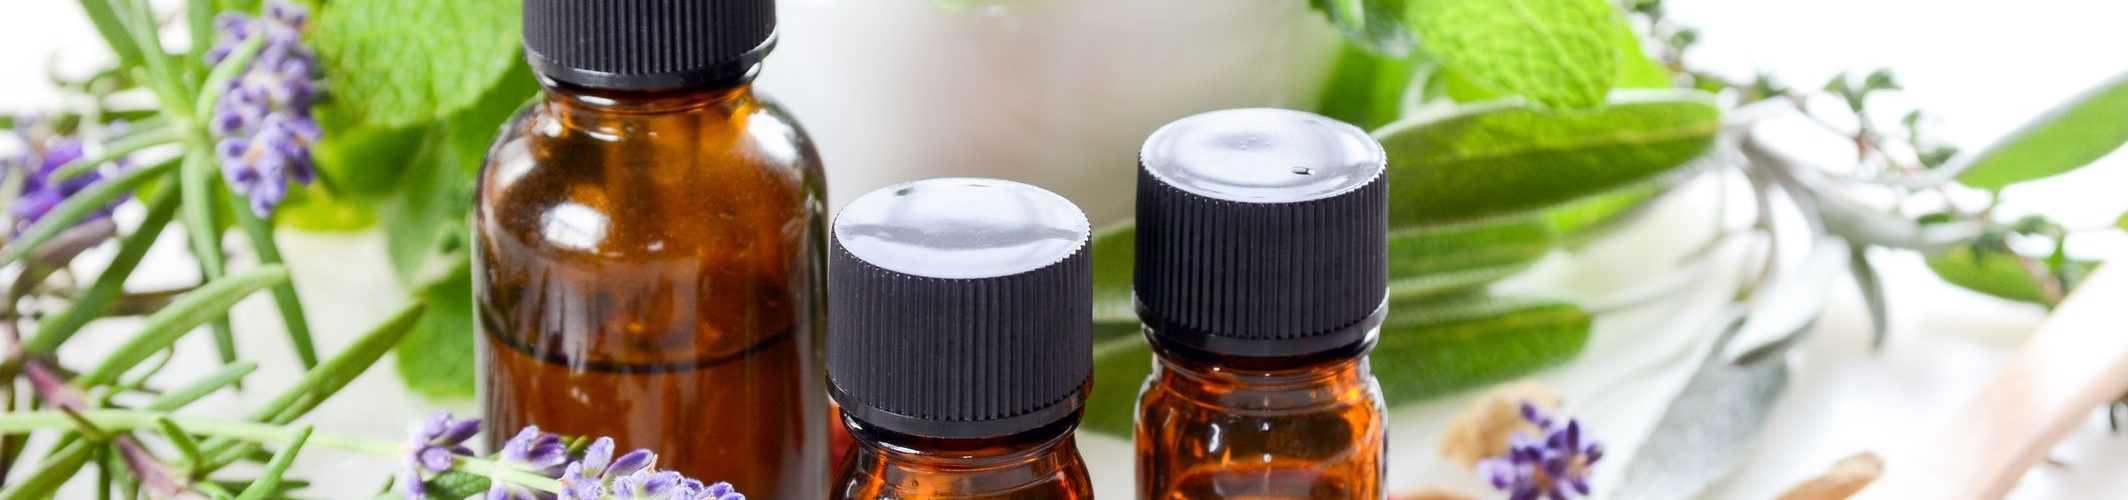 meilleure-huile-ratero